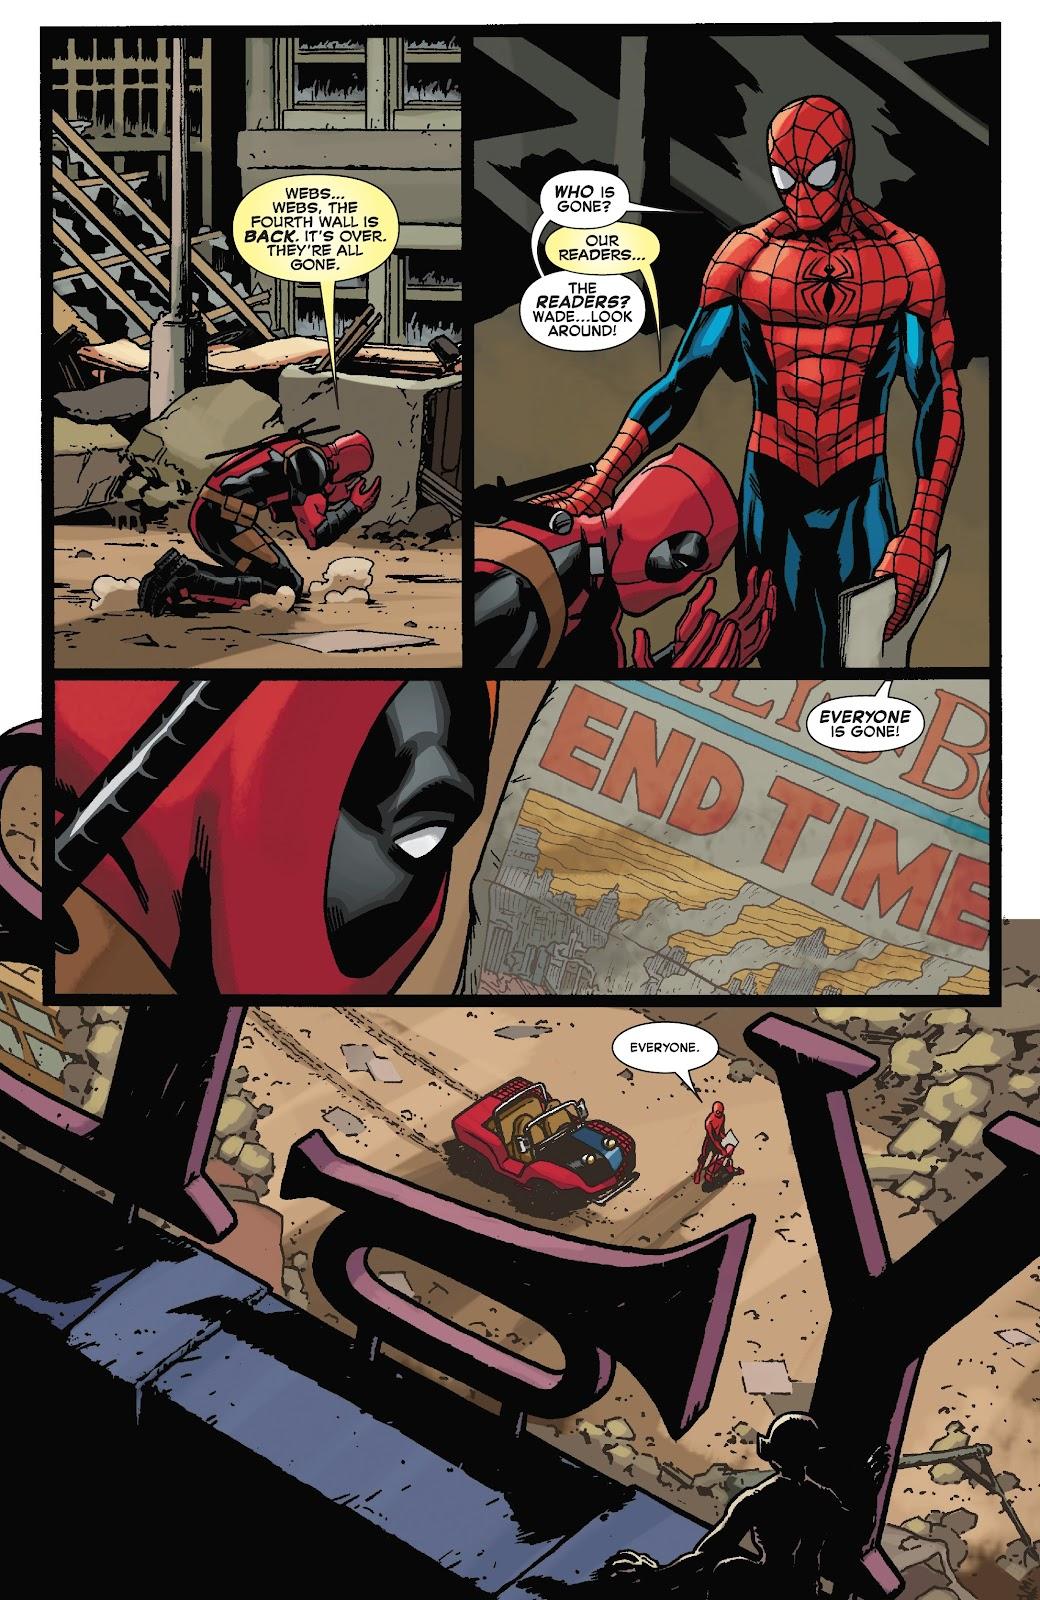 Read online Spider-Man/Deadpool comic -  Issue #46 - 8